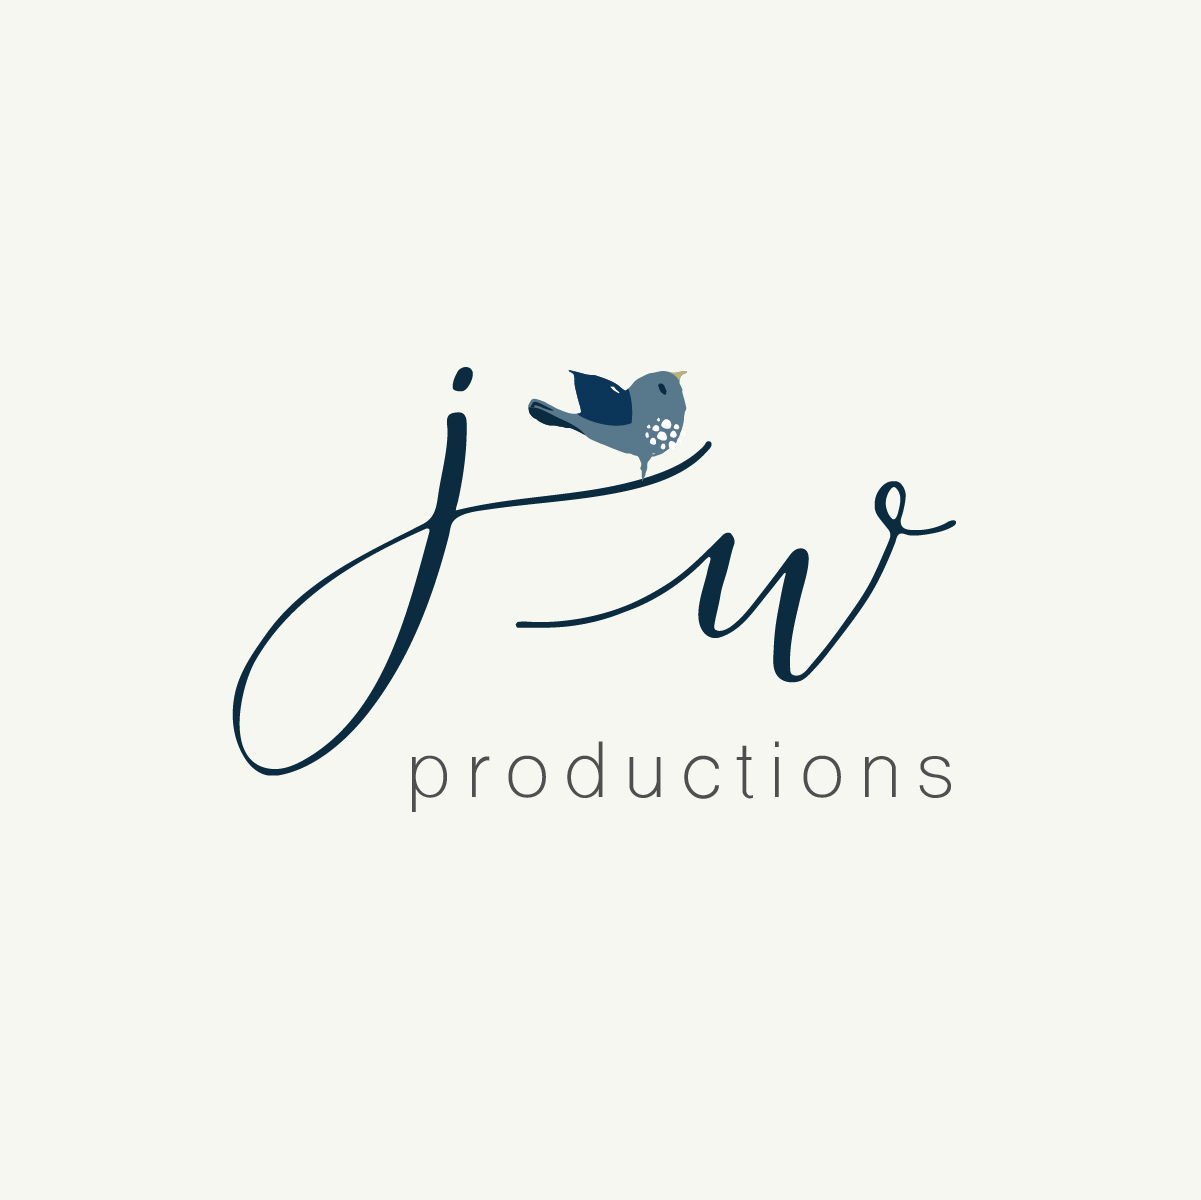 monogram logo with blue bird